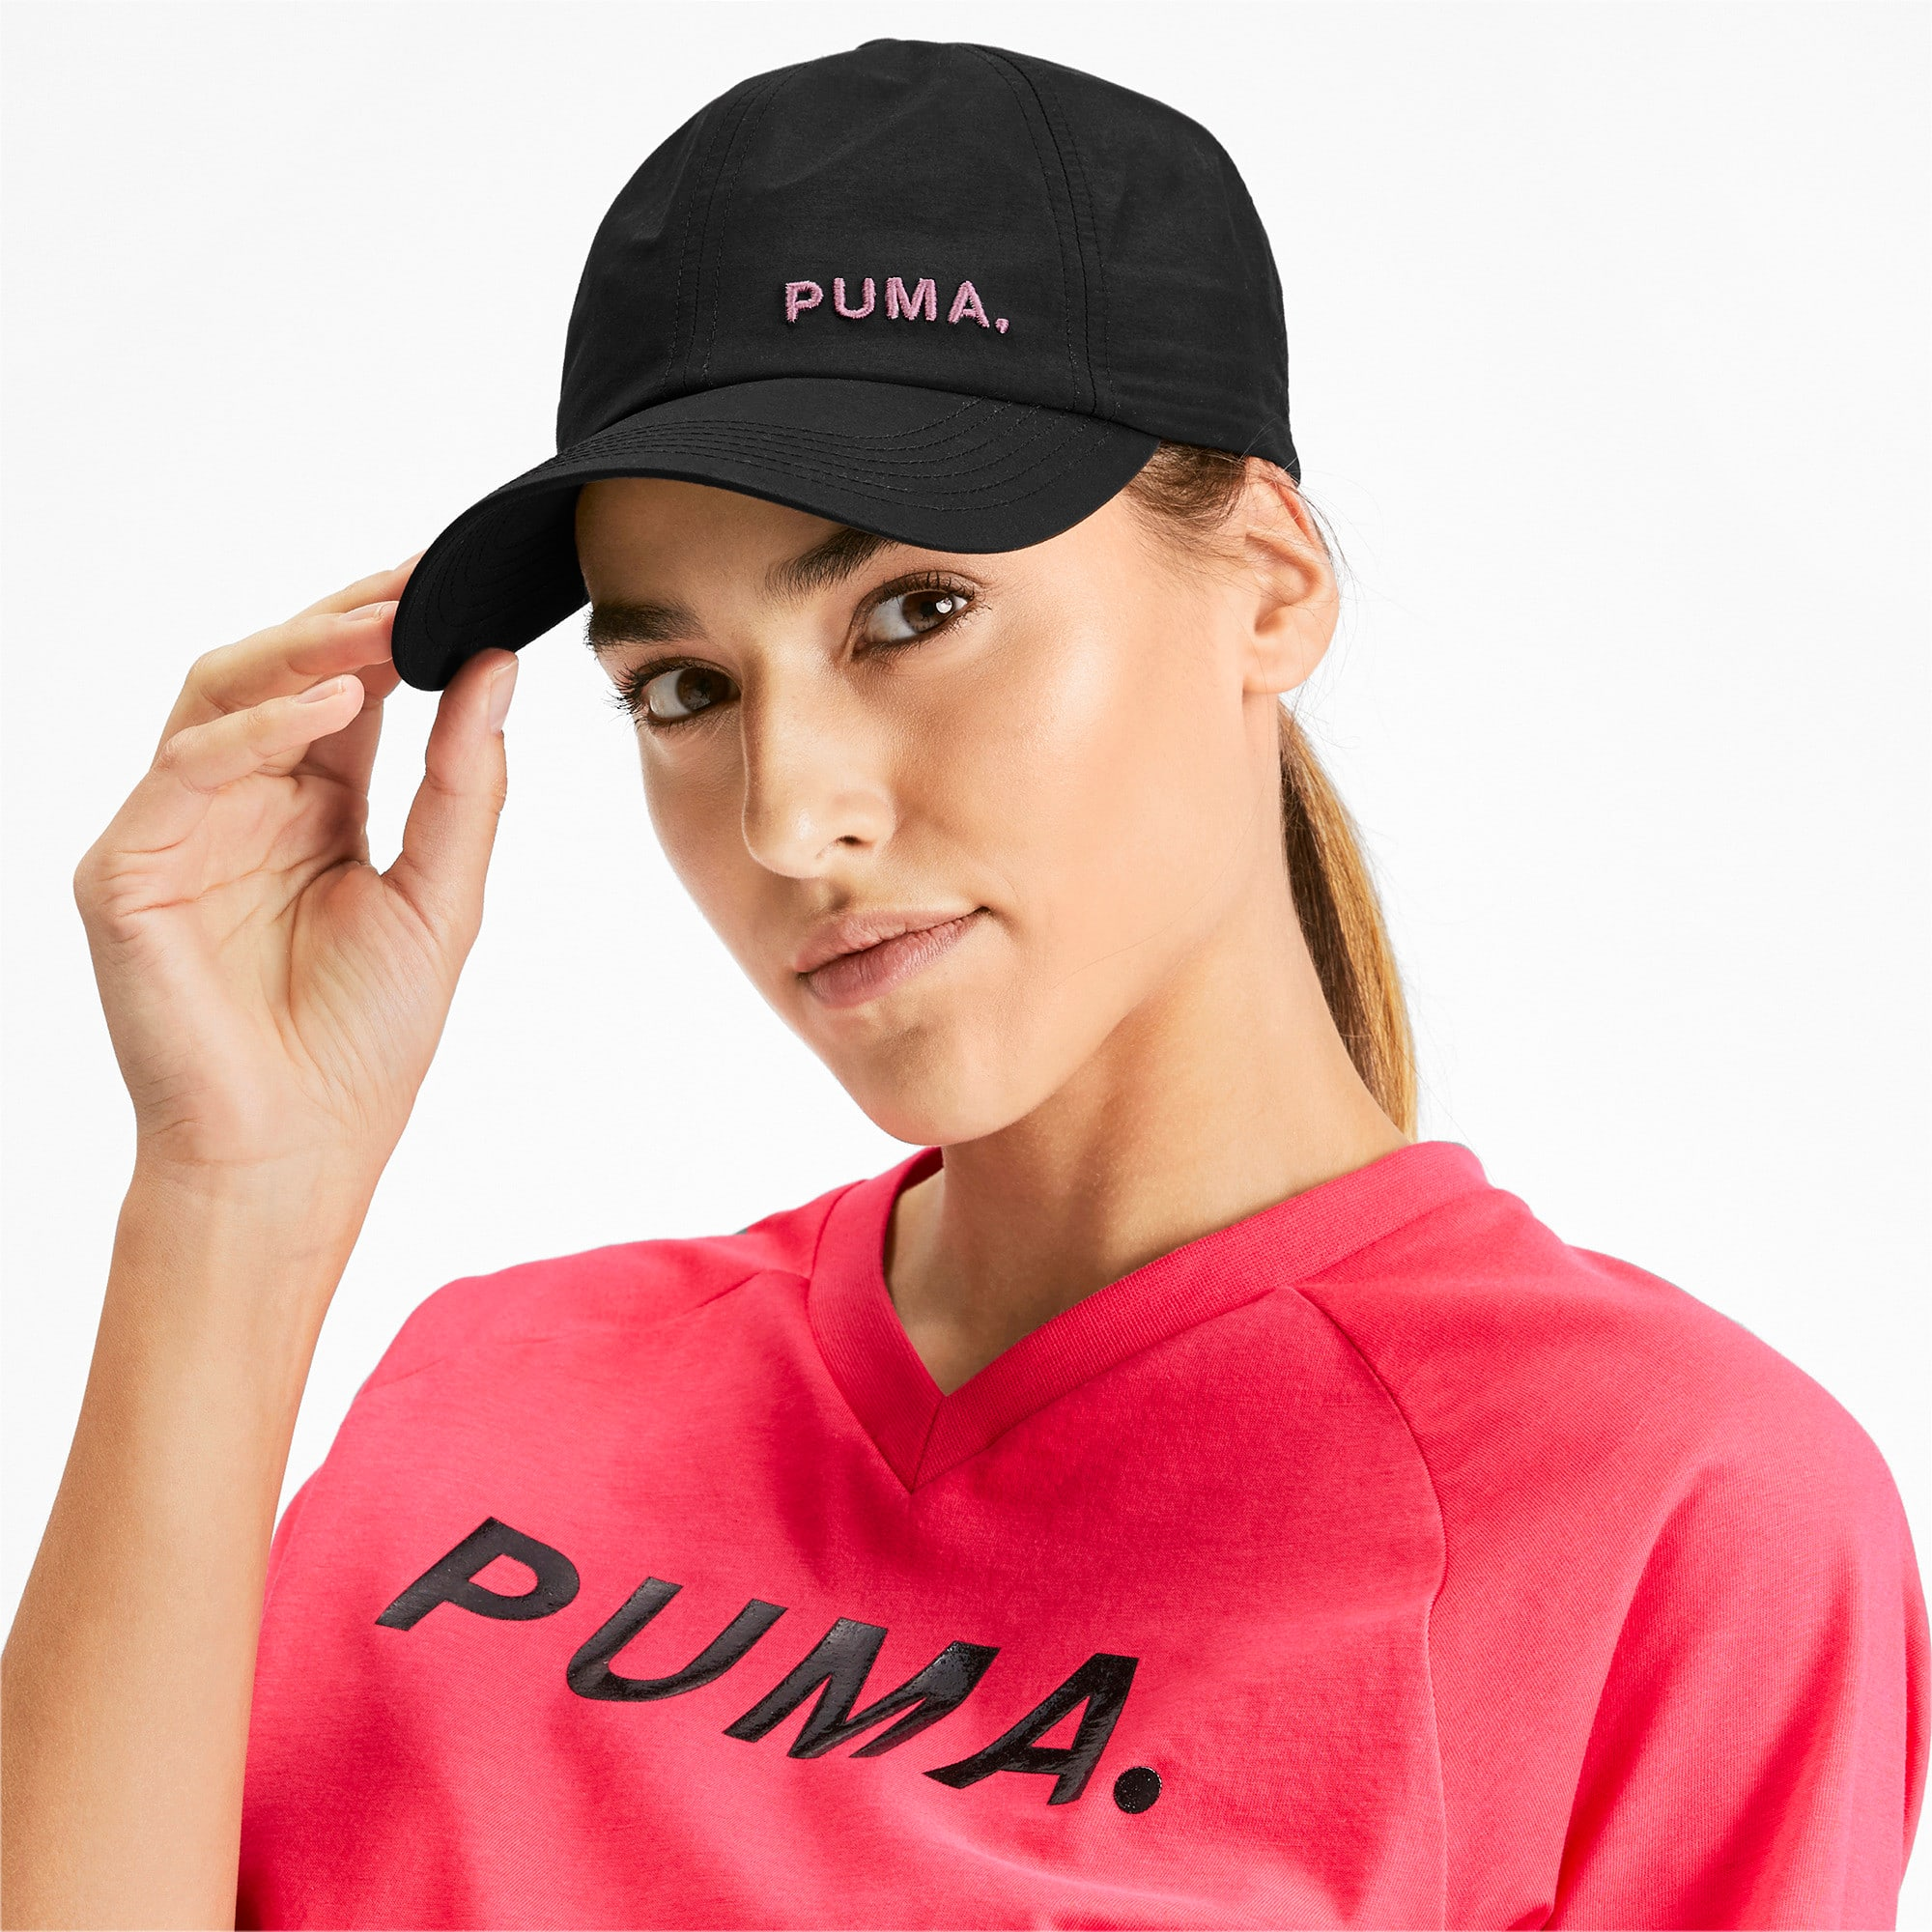 Thumbnail 2 of Women's Shift Cap, Puma Black-Bridal Rose, medium